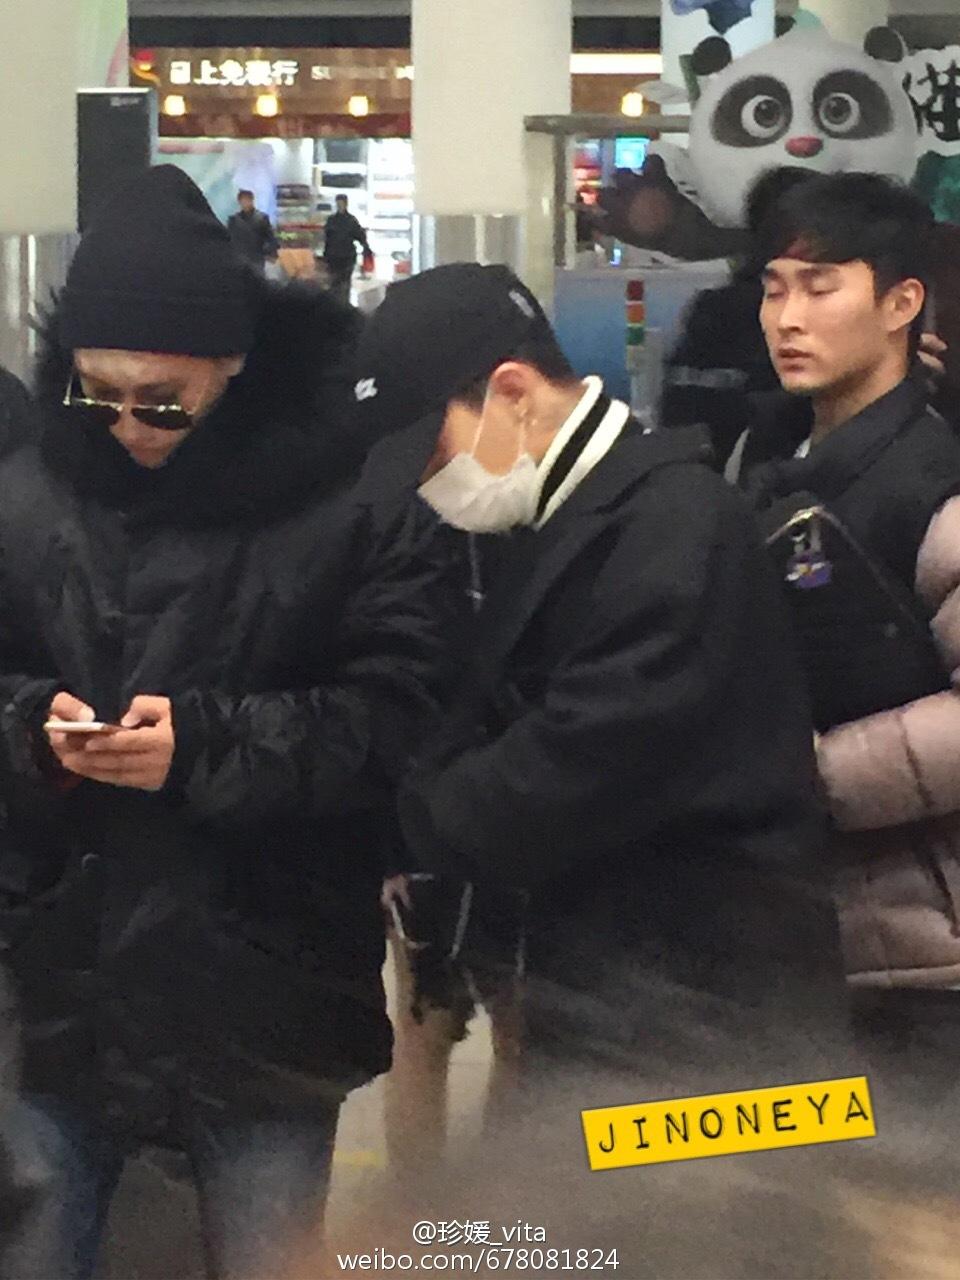 Big Bang - Beijing Airport - 31dec2015 - 珍媛_vita - 01